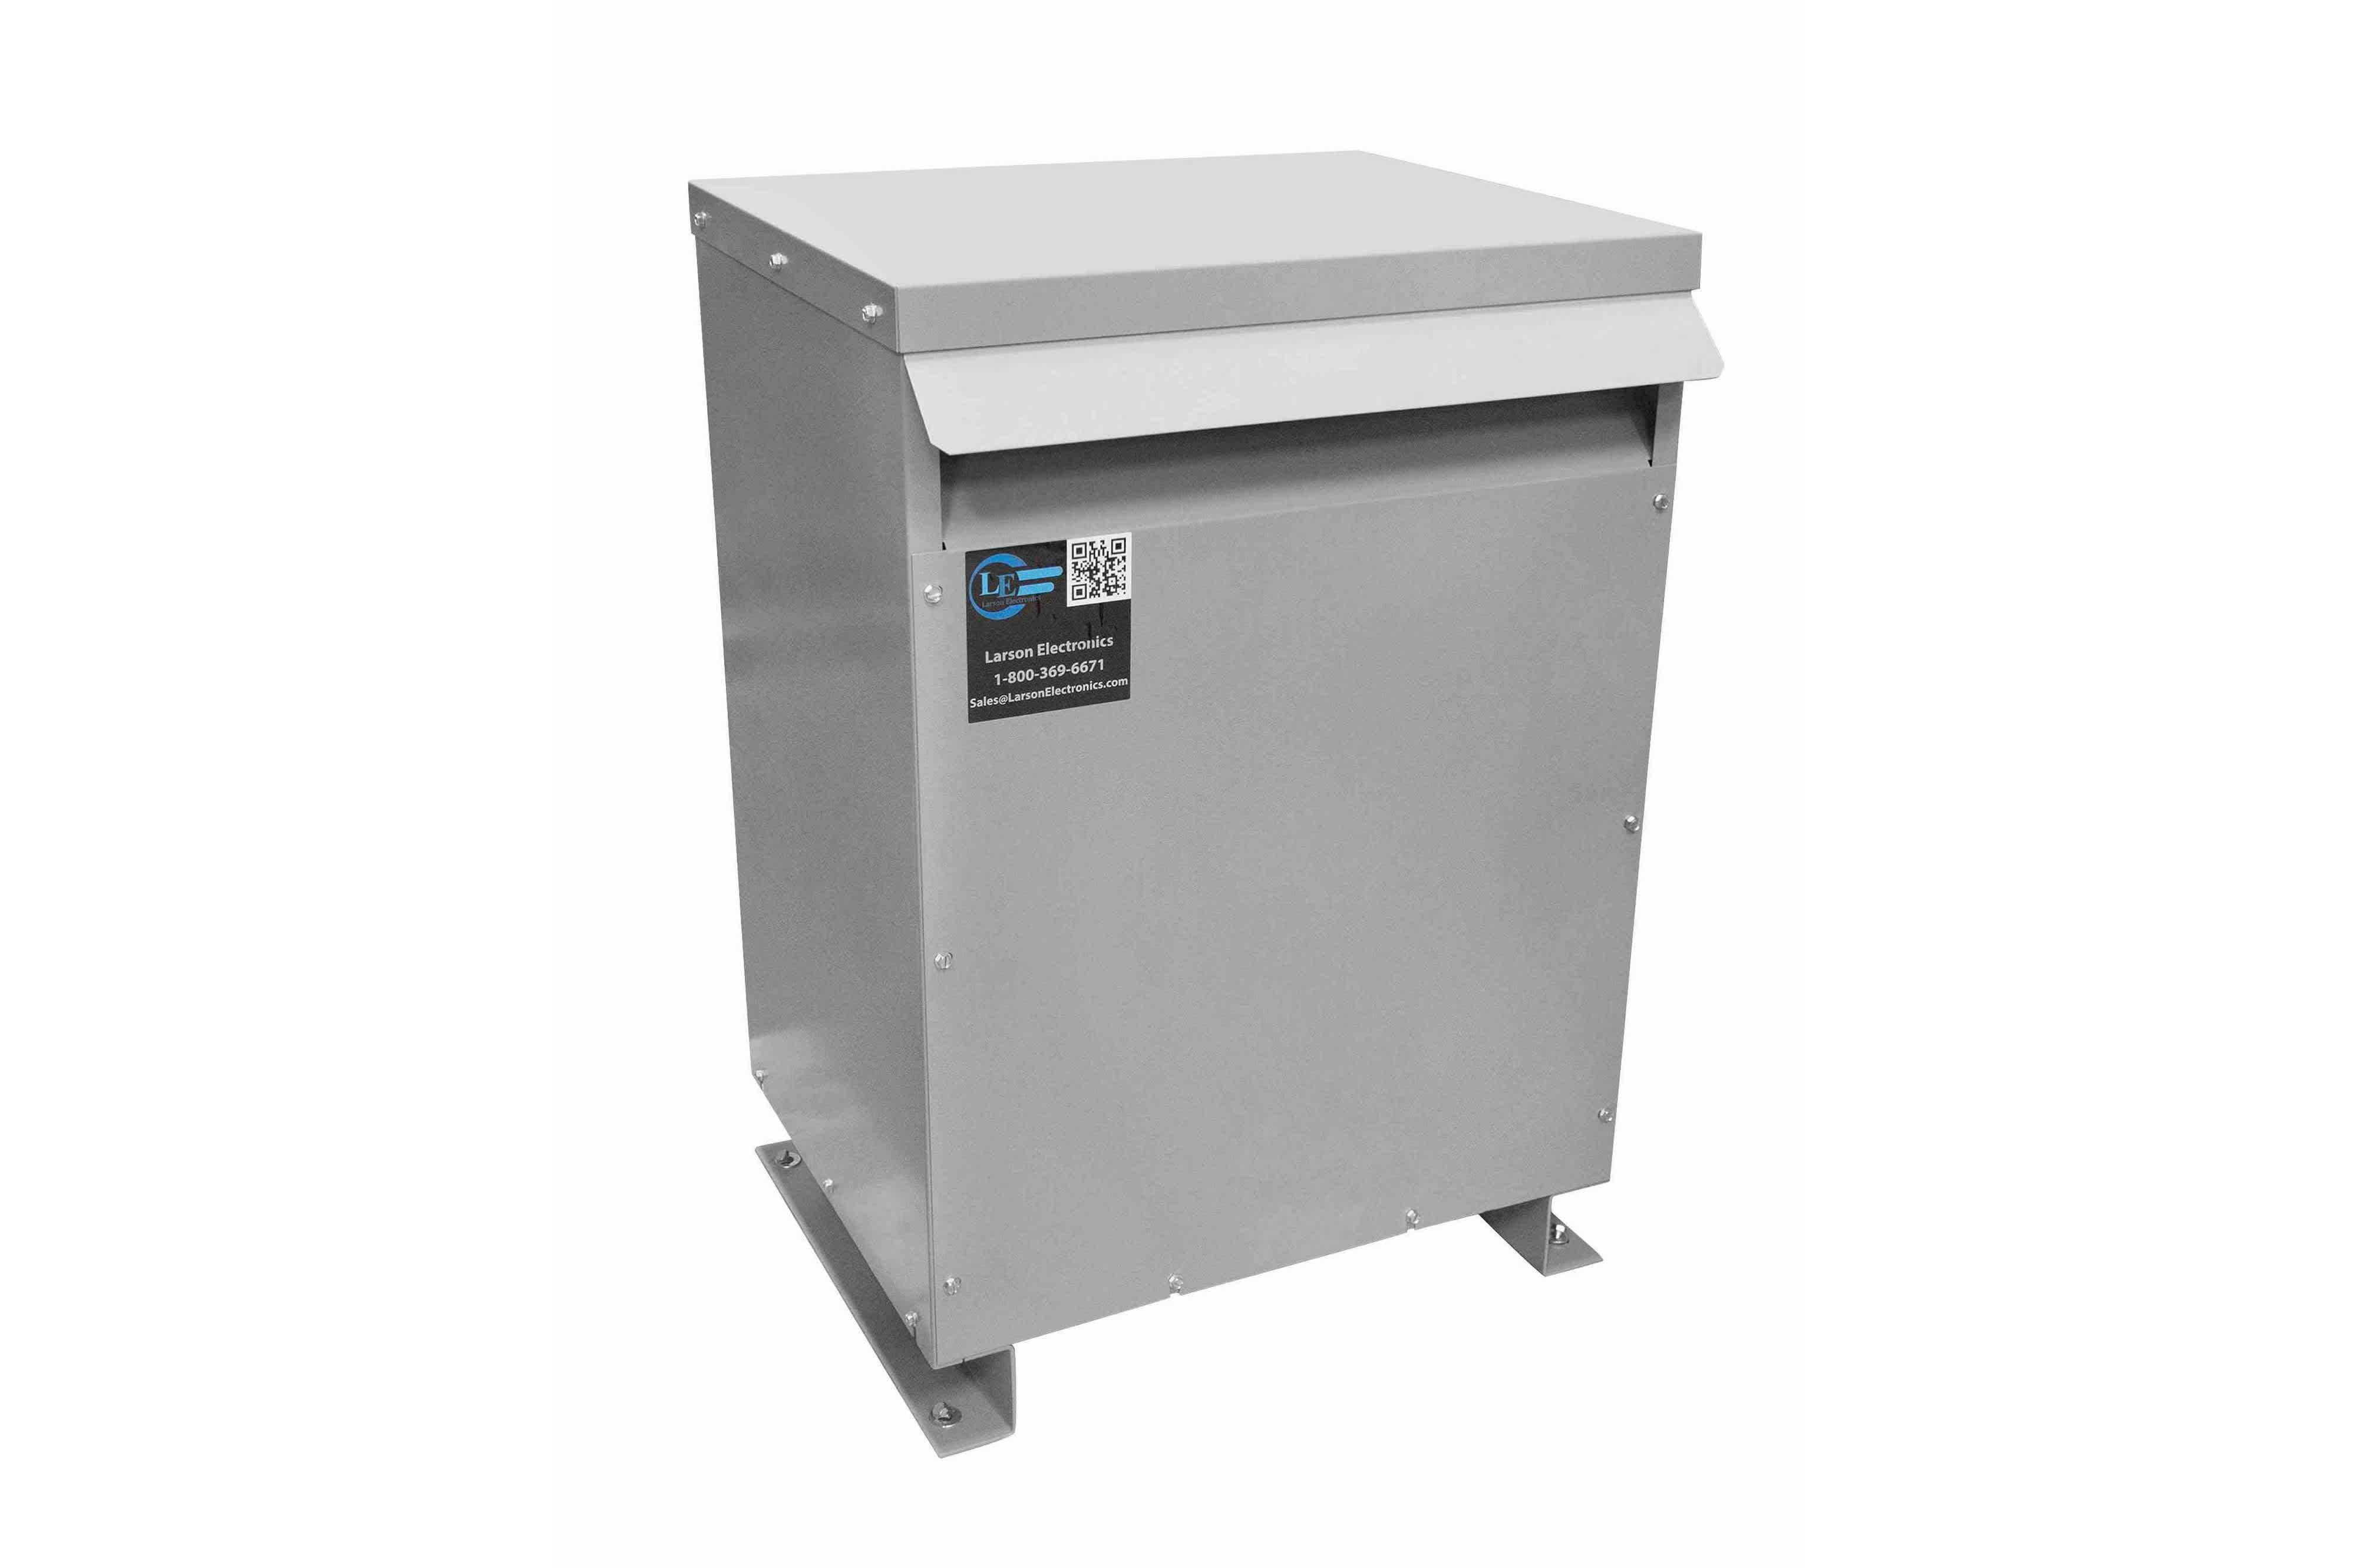 60 kVA 3PH Isolation Transformer, 600V Wye Primary, 415V Delta Secondary, N3R, Ventilated, 60 Hz